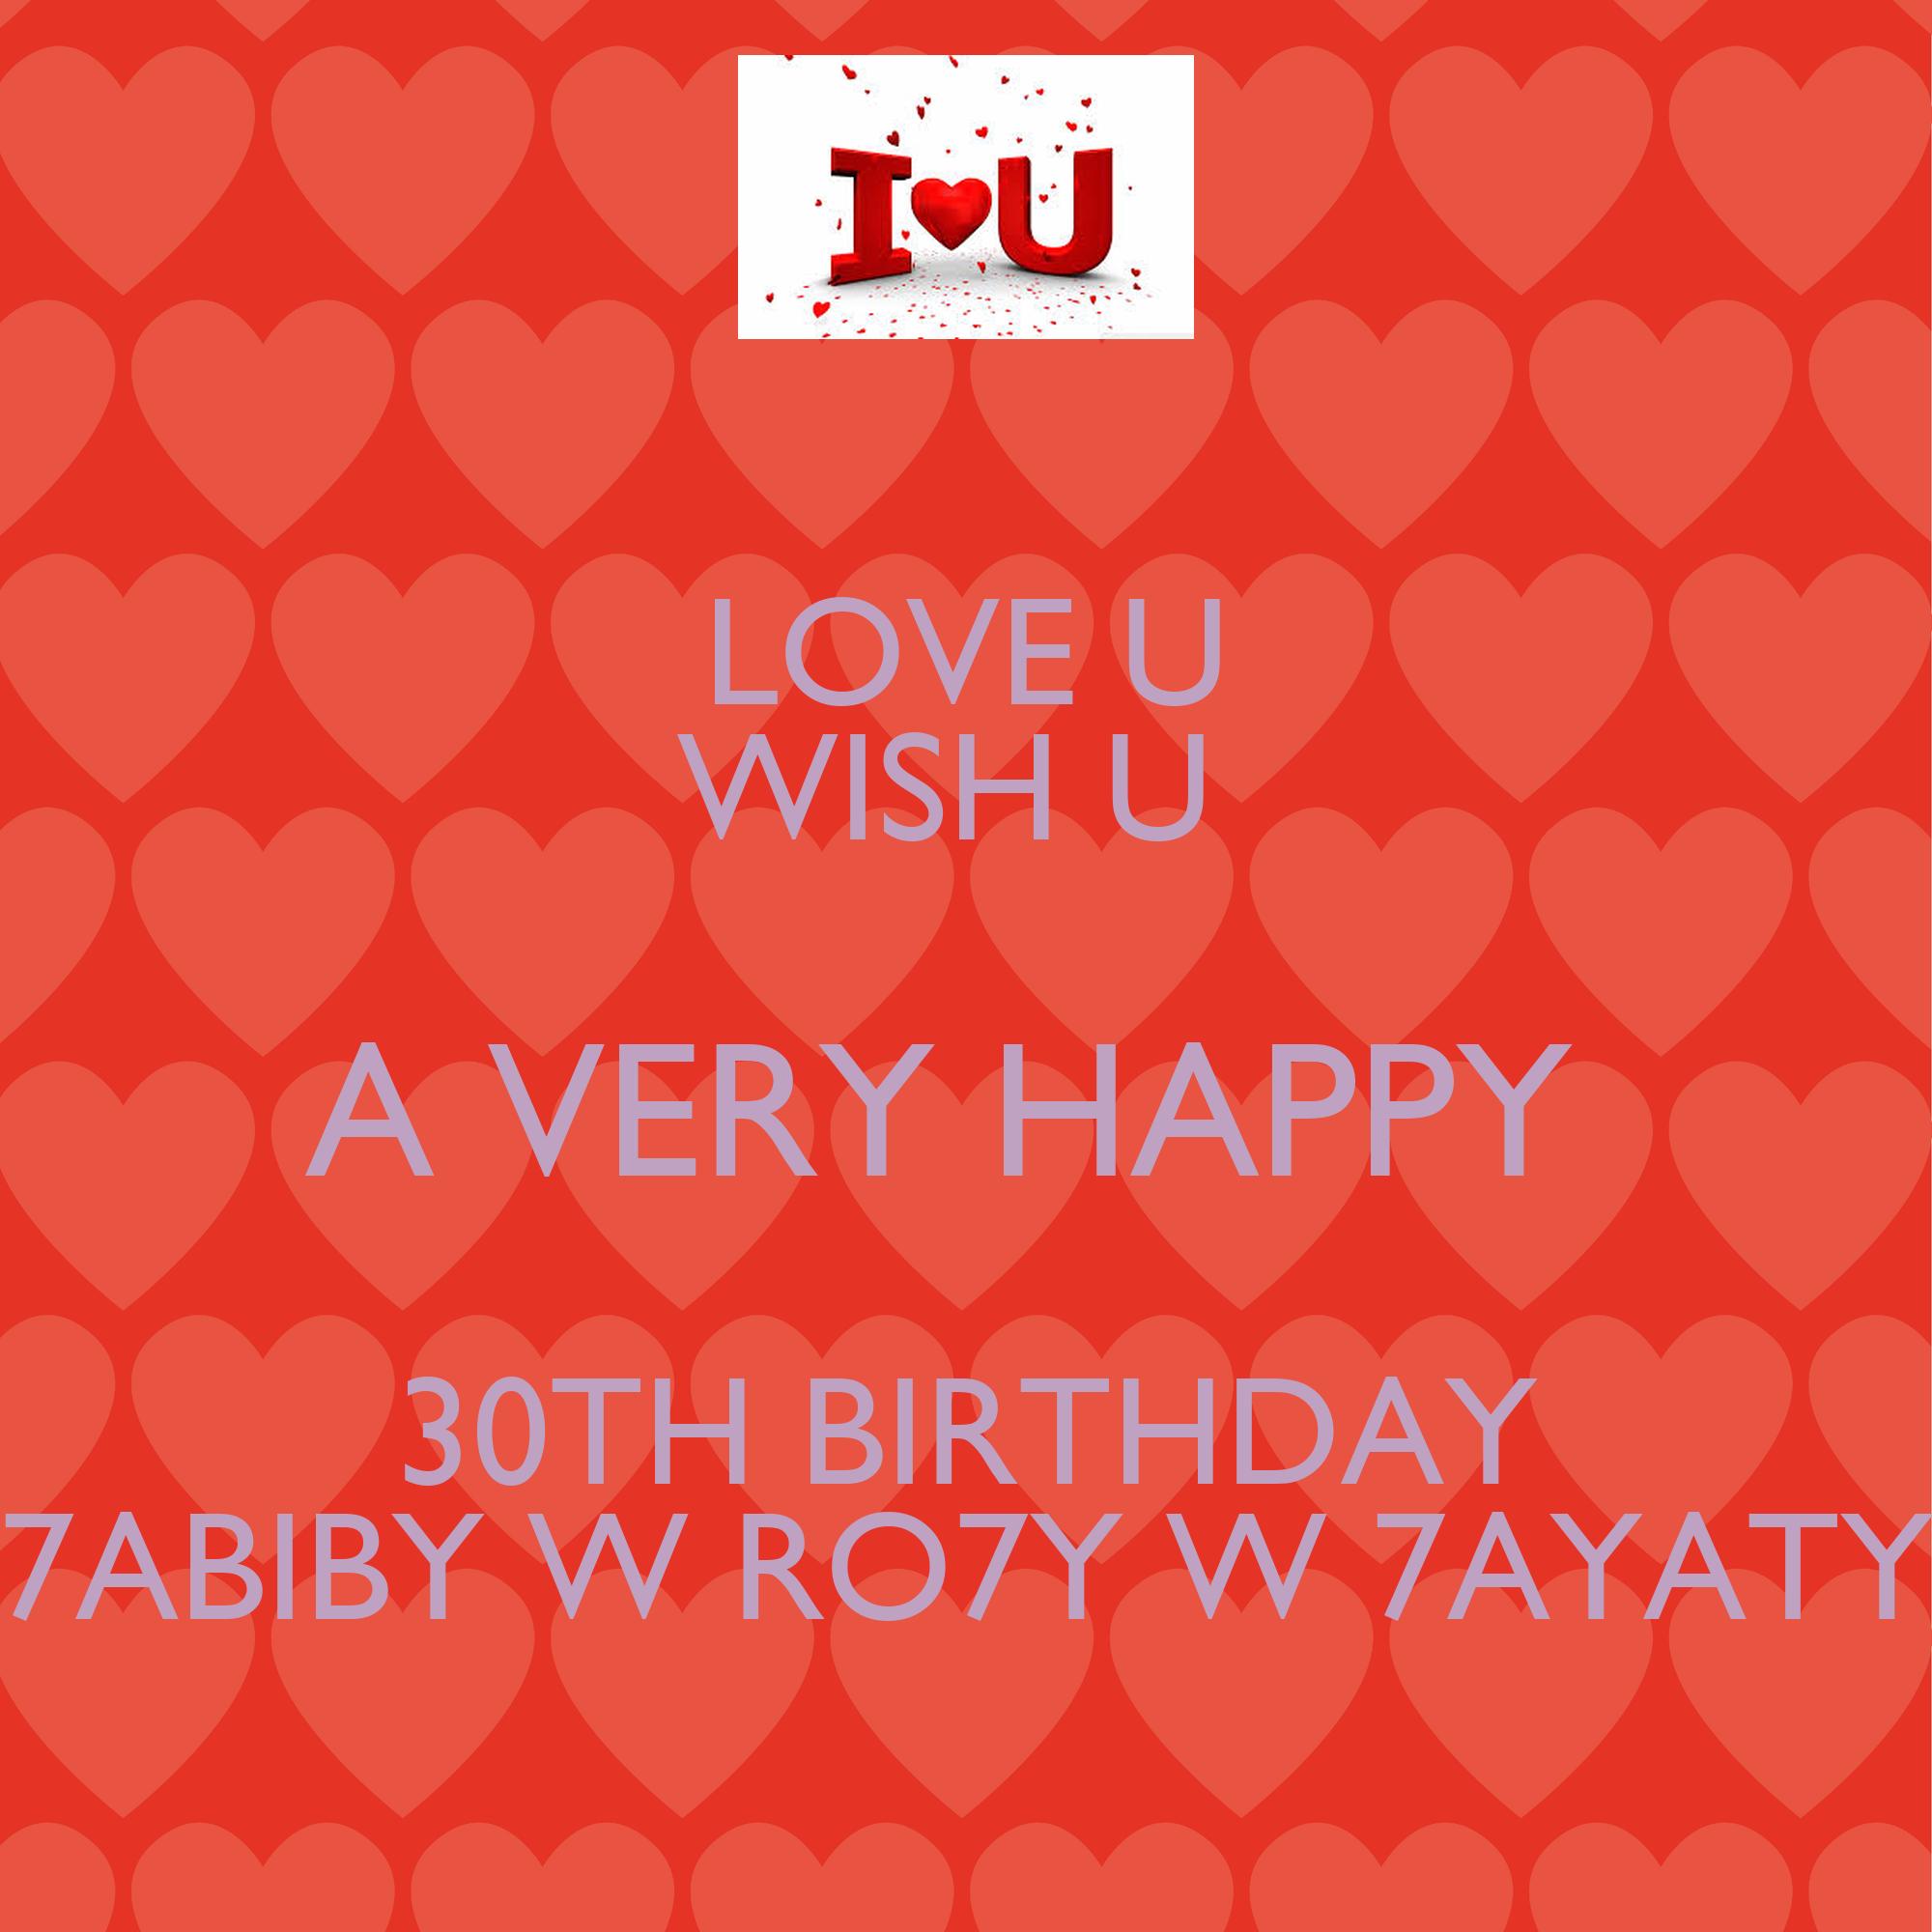 Love U Wish U A Very Happy 30th Birthday 7abiby W Ro7y W Wish U Happy Birthday Photo